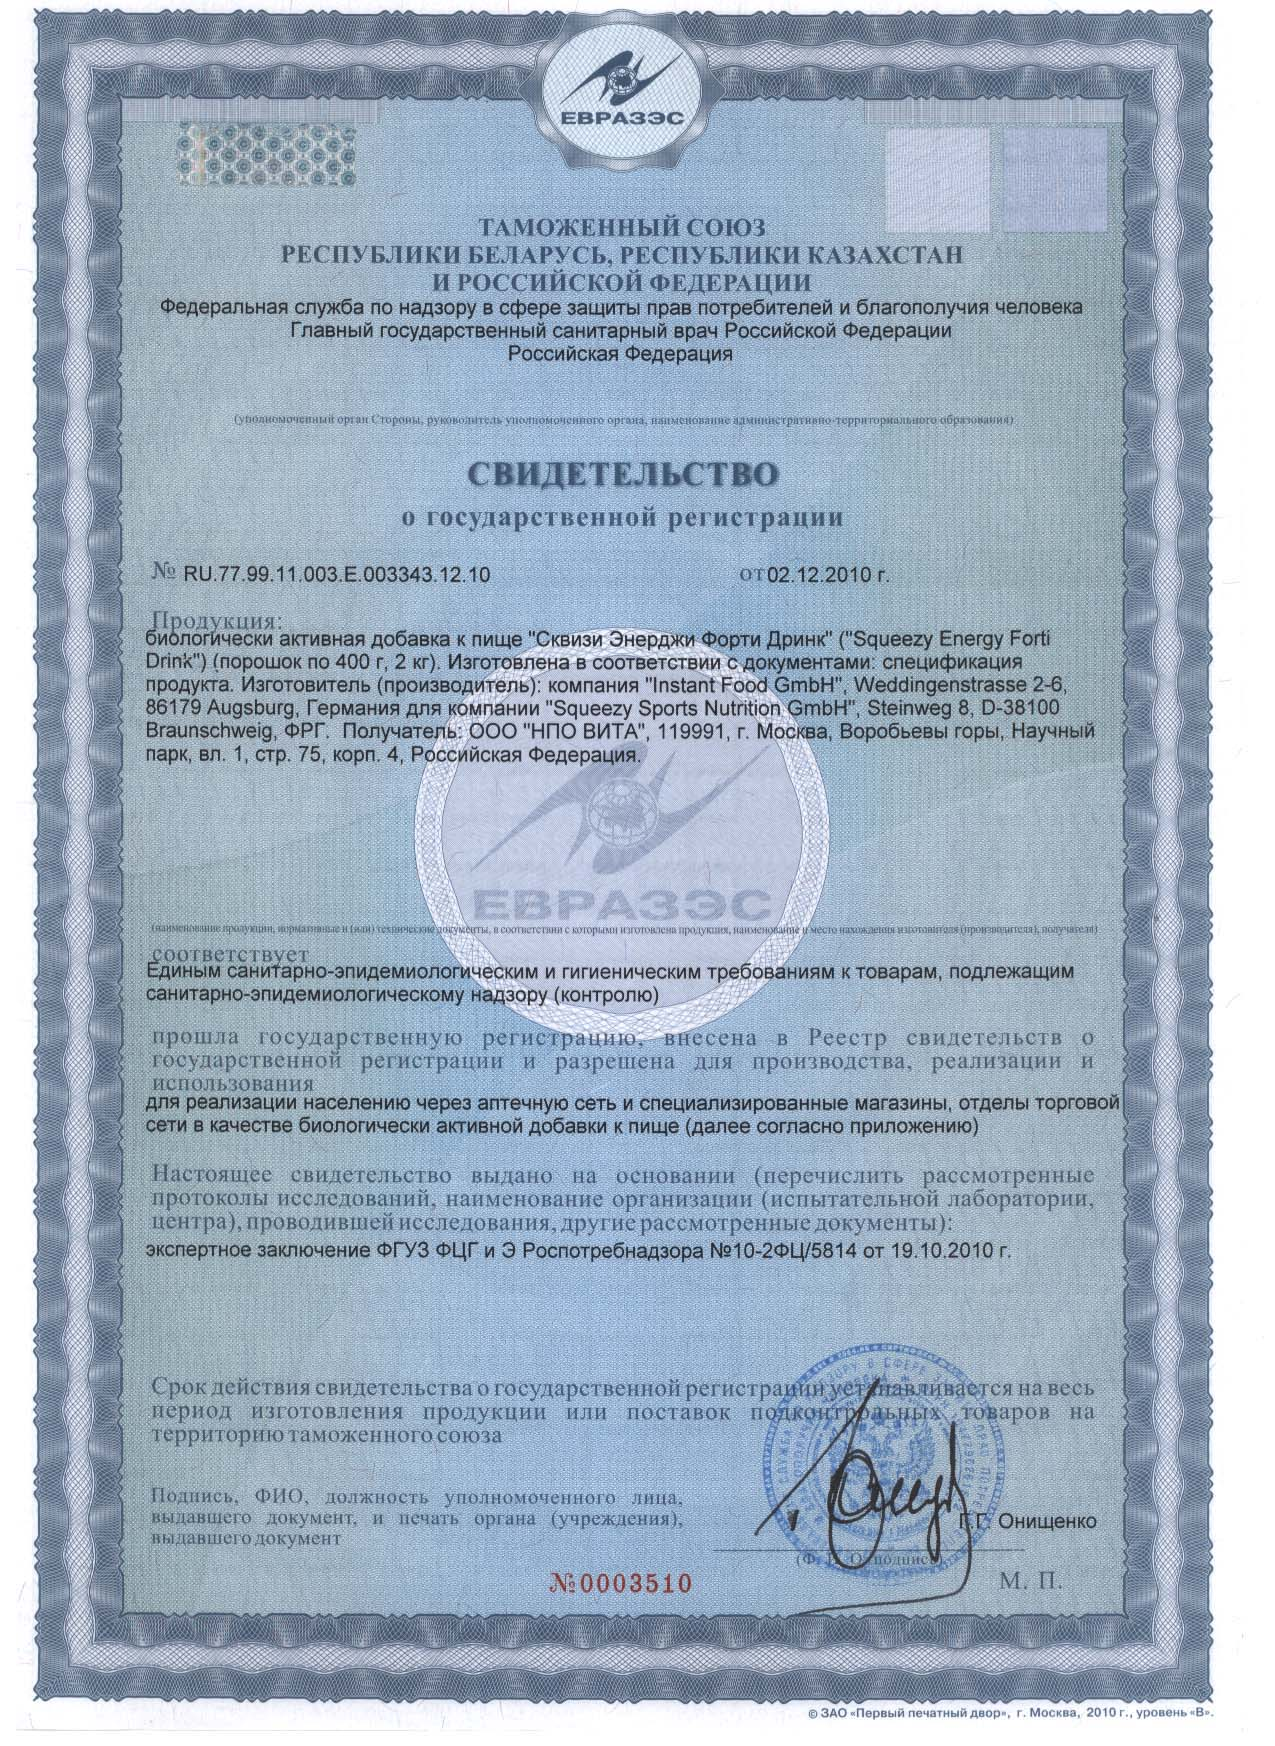 Сертификат ENERGY FORTI DRINK